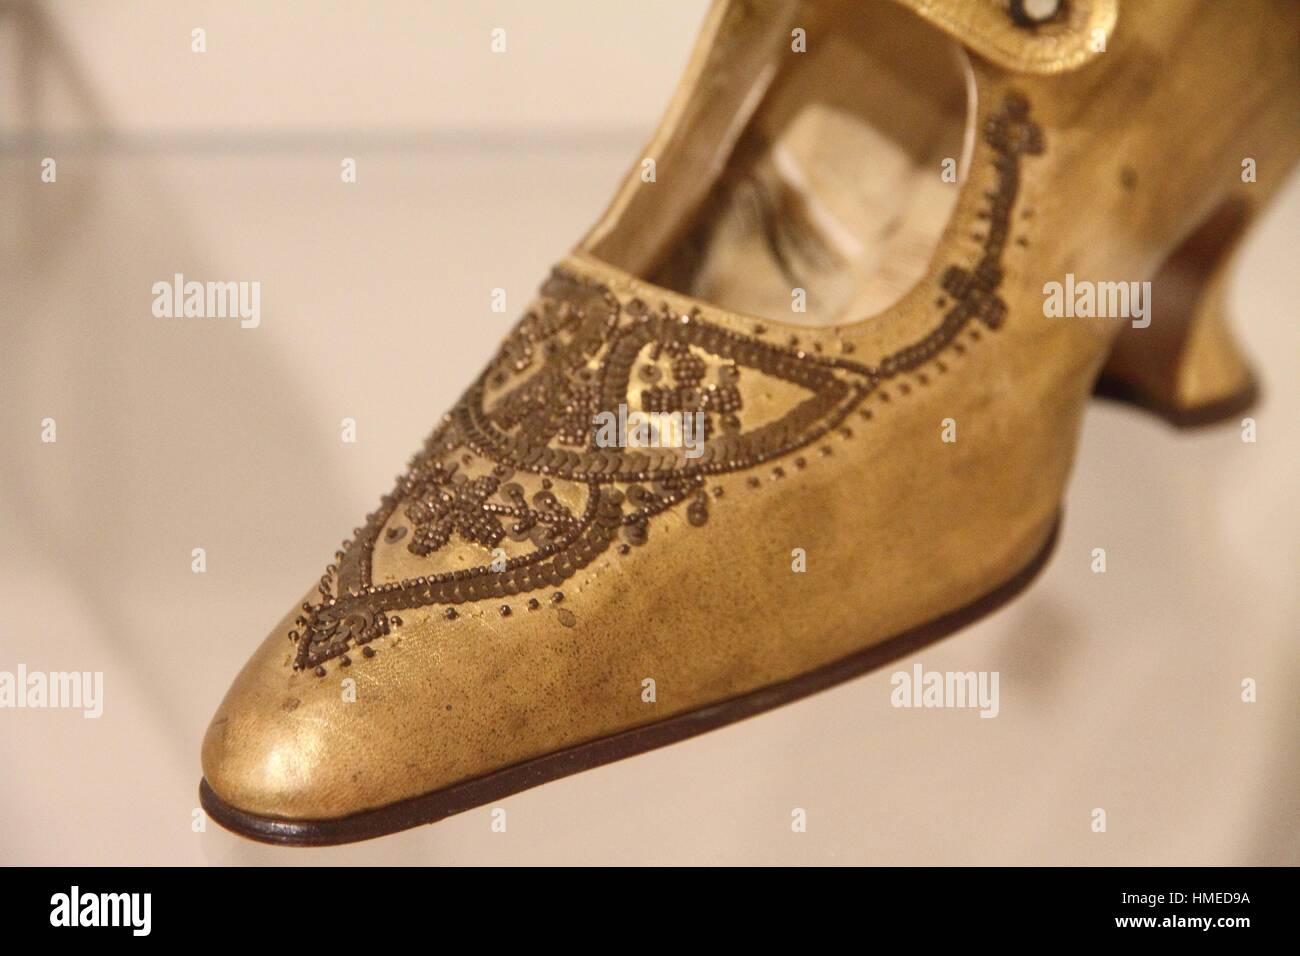 6d740333083d3 Footwear Museum Immagini   Footwear Museum Fotos Stock - Alamy